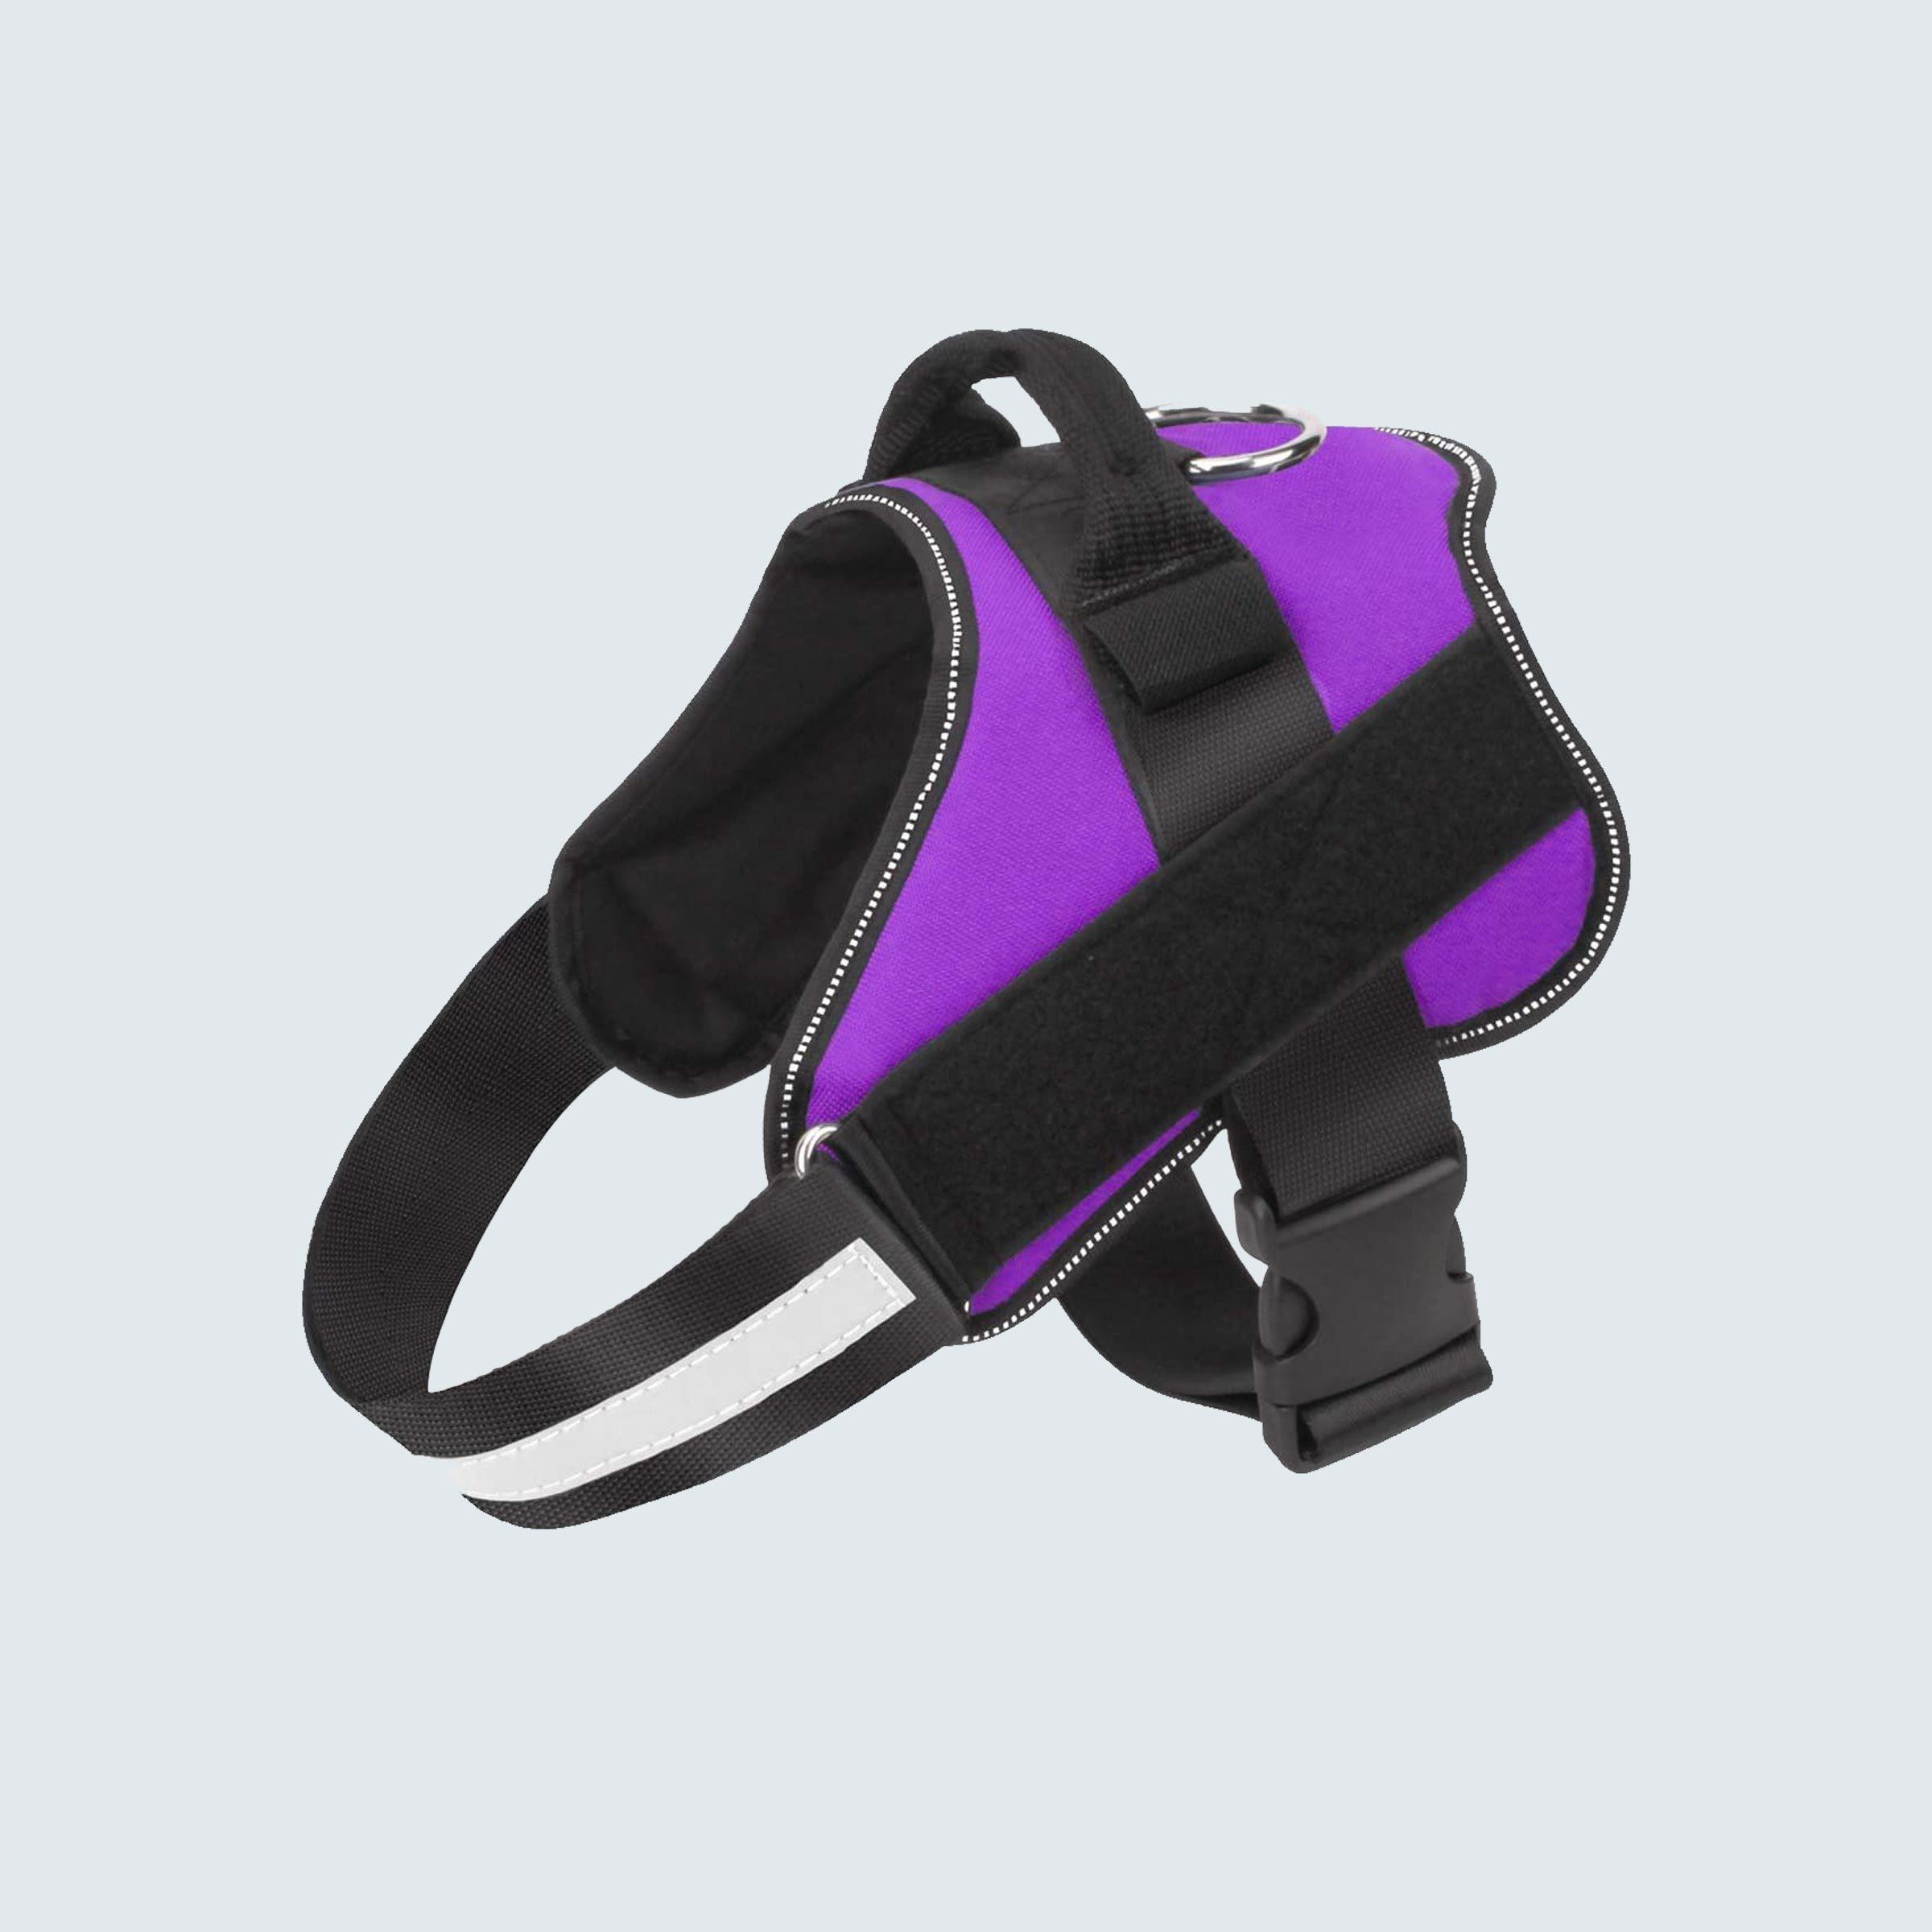 Bolux No-Pull Dog Harness